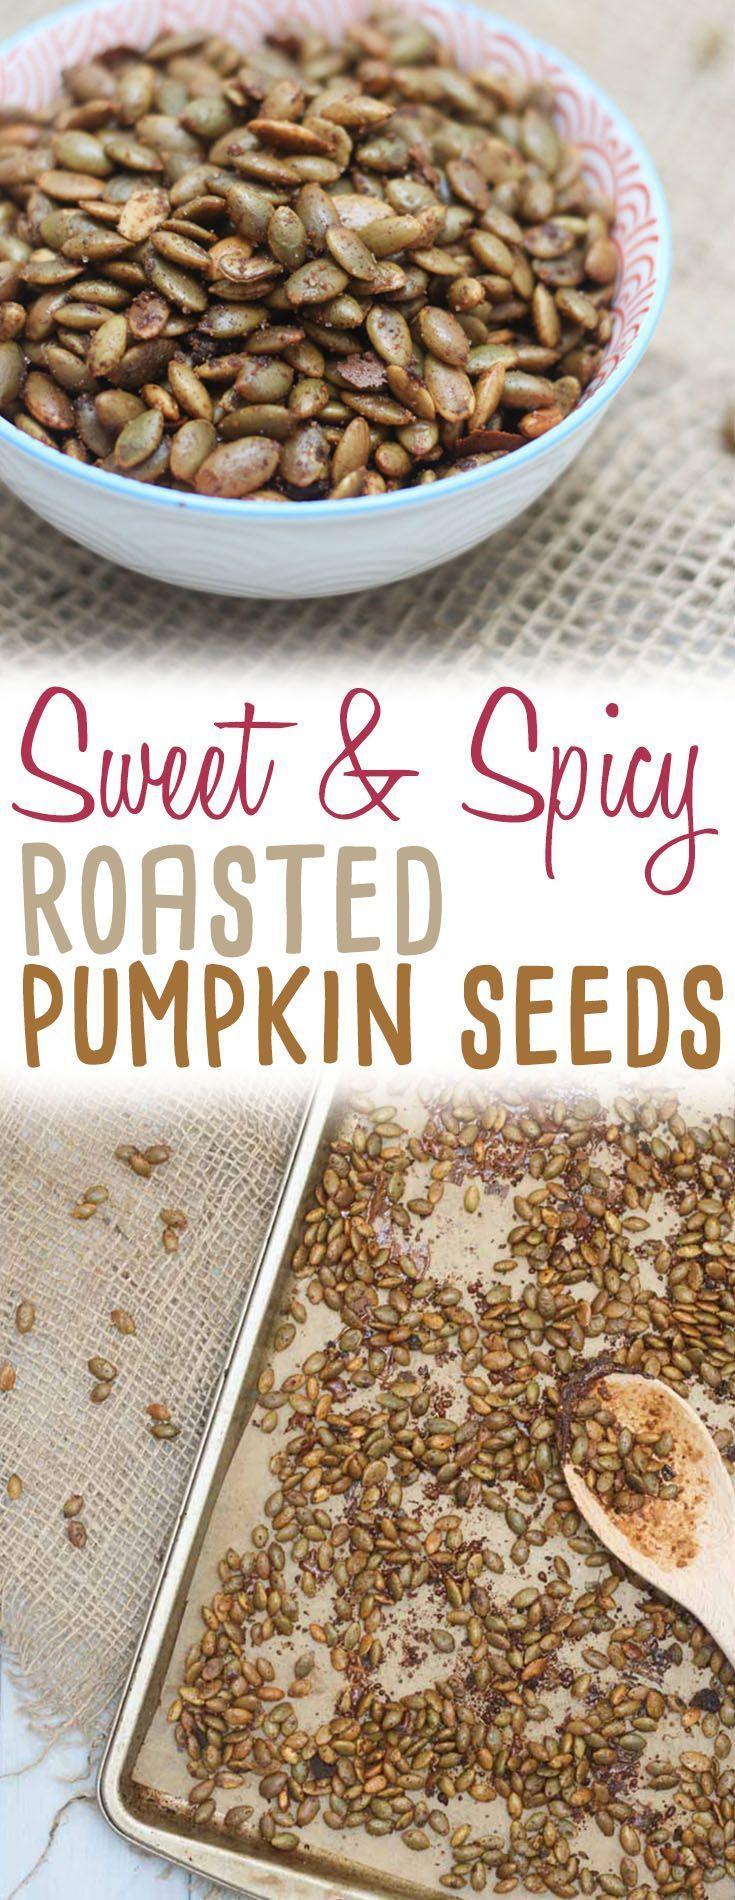 Sweet and Spicy Roasted Pumpkin Seeds   Gluten Free & Vegan Snack! - Abbey's Kitchen